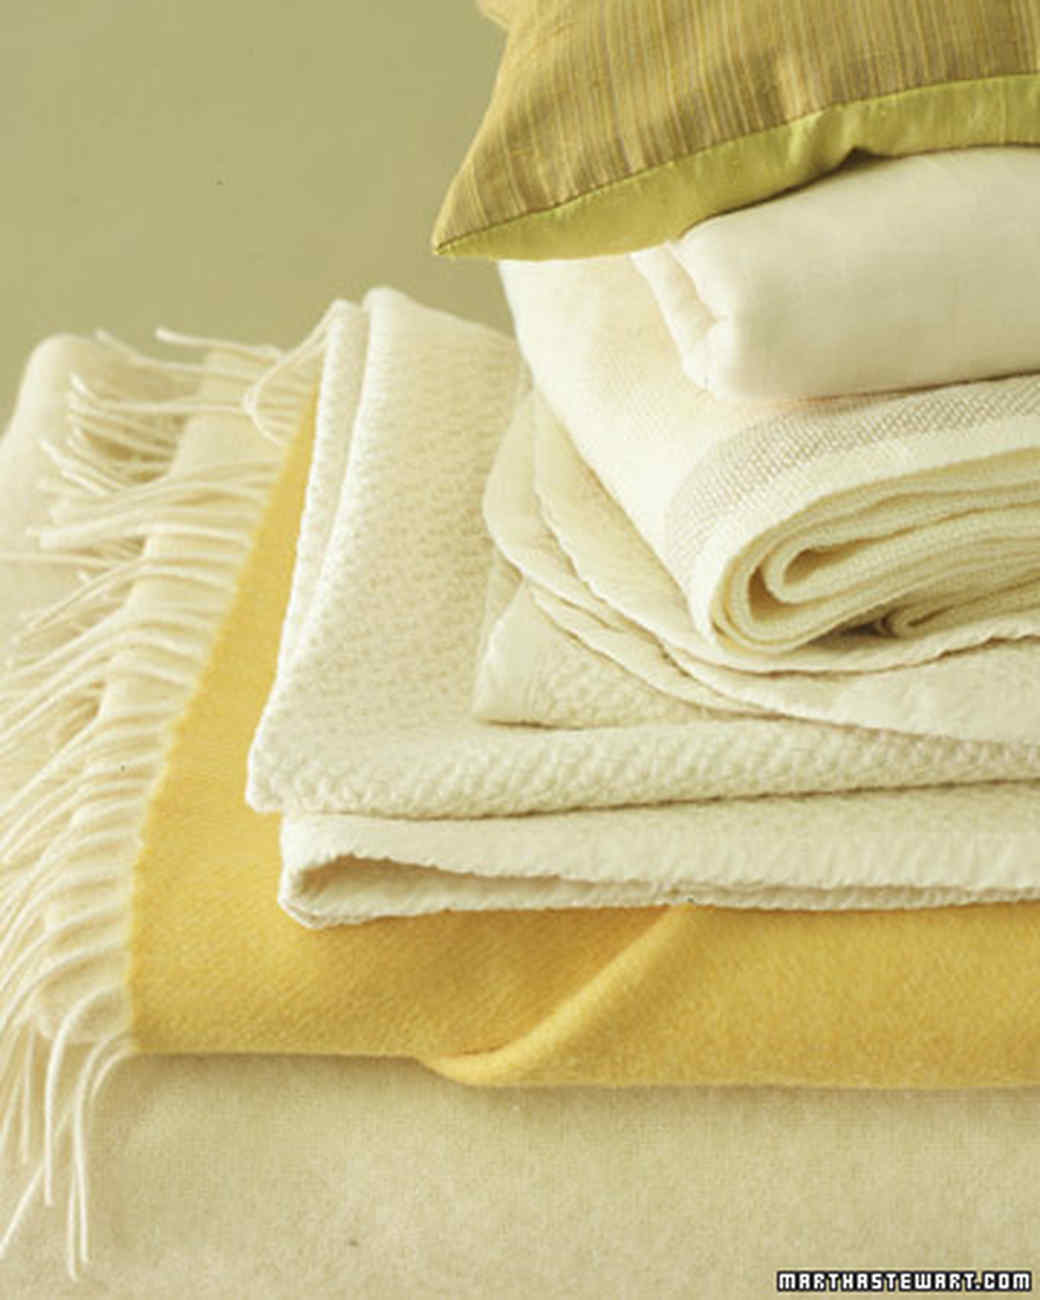 ba101309_0505_blankets.jpg